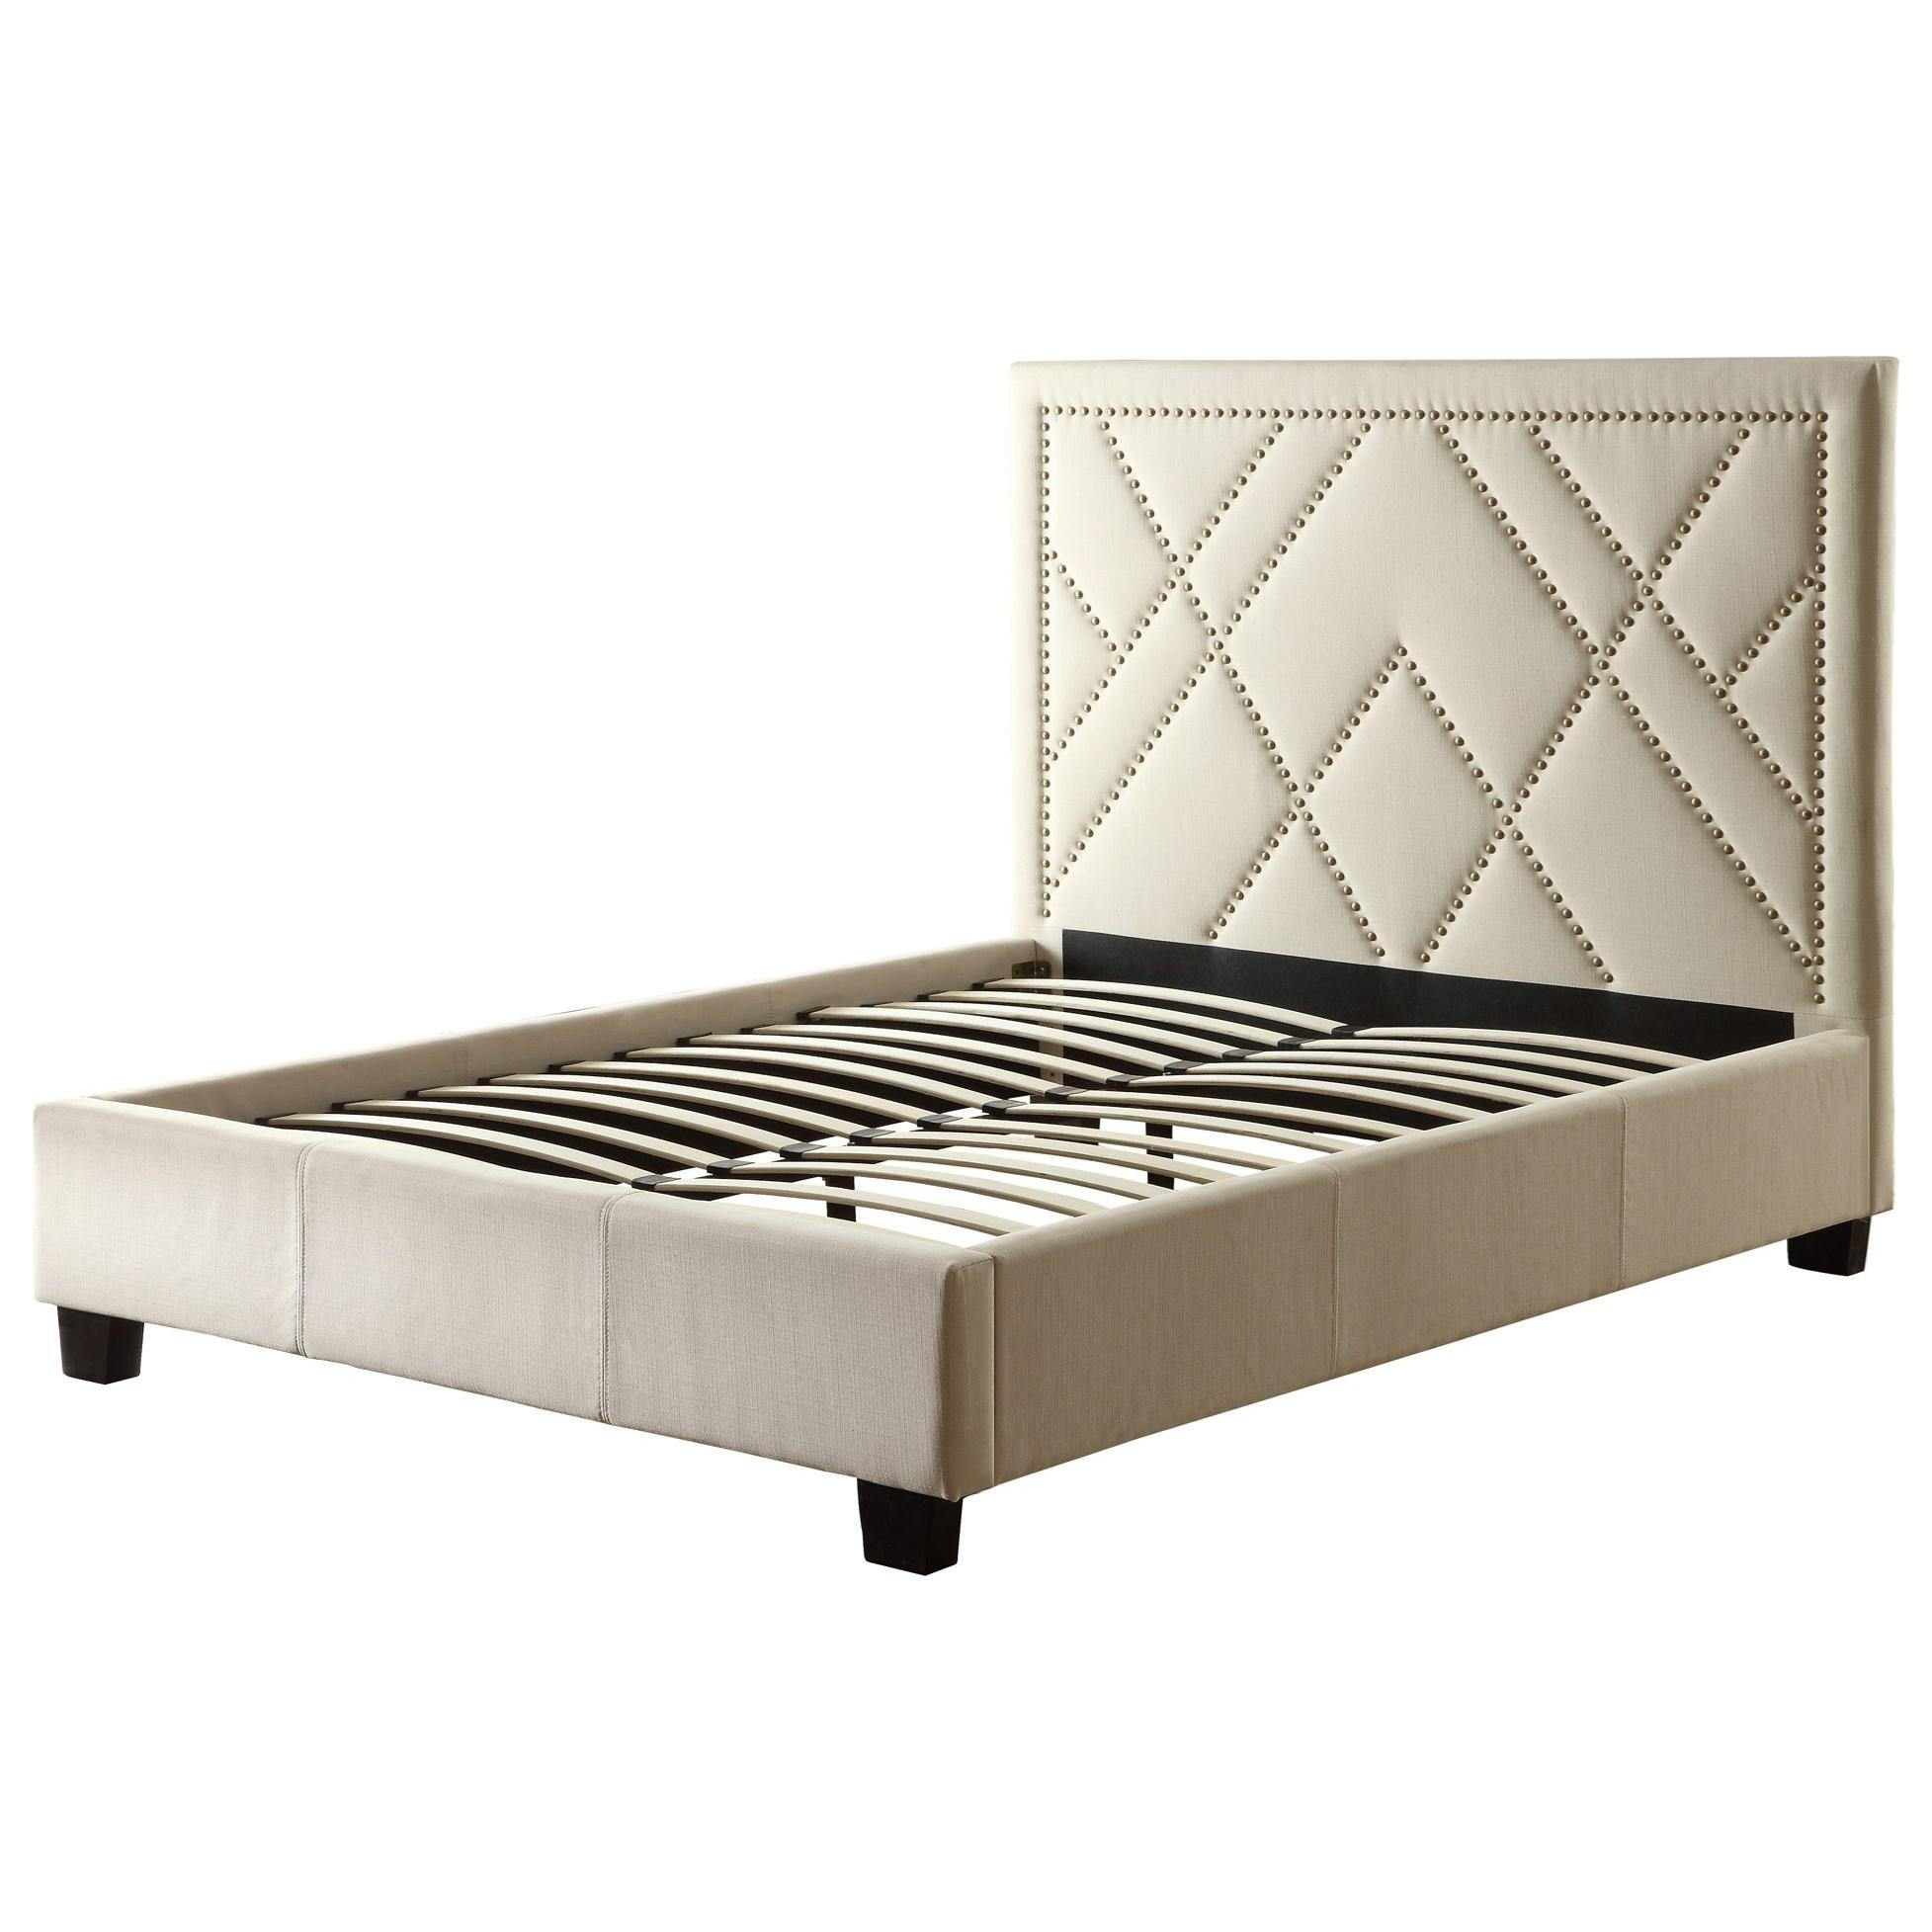 King Vienne Platform Bed